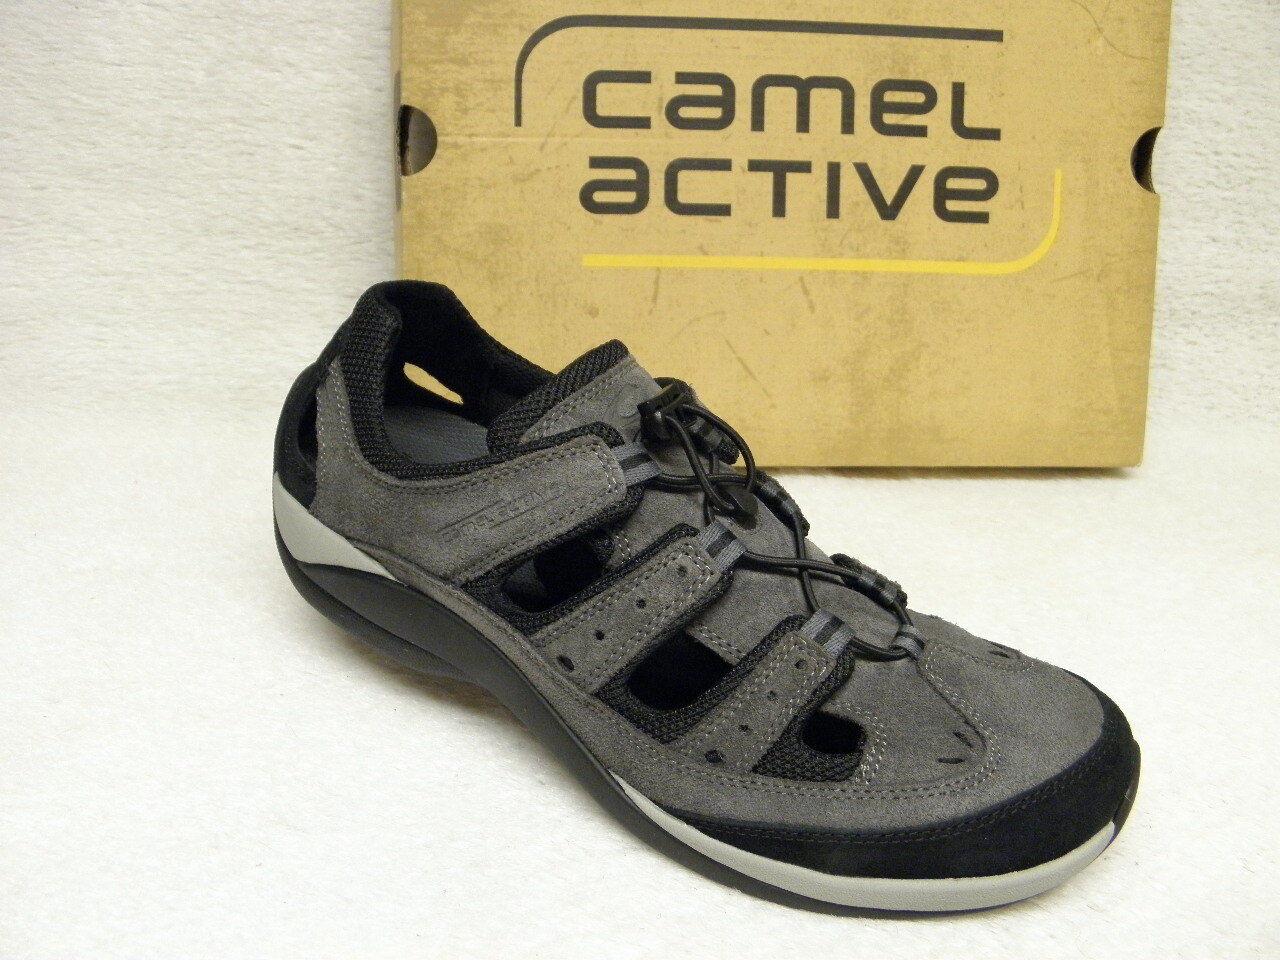 Camel active ® rotuziert  bisher   grau  gratis Premium-Socken (C39)